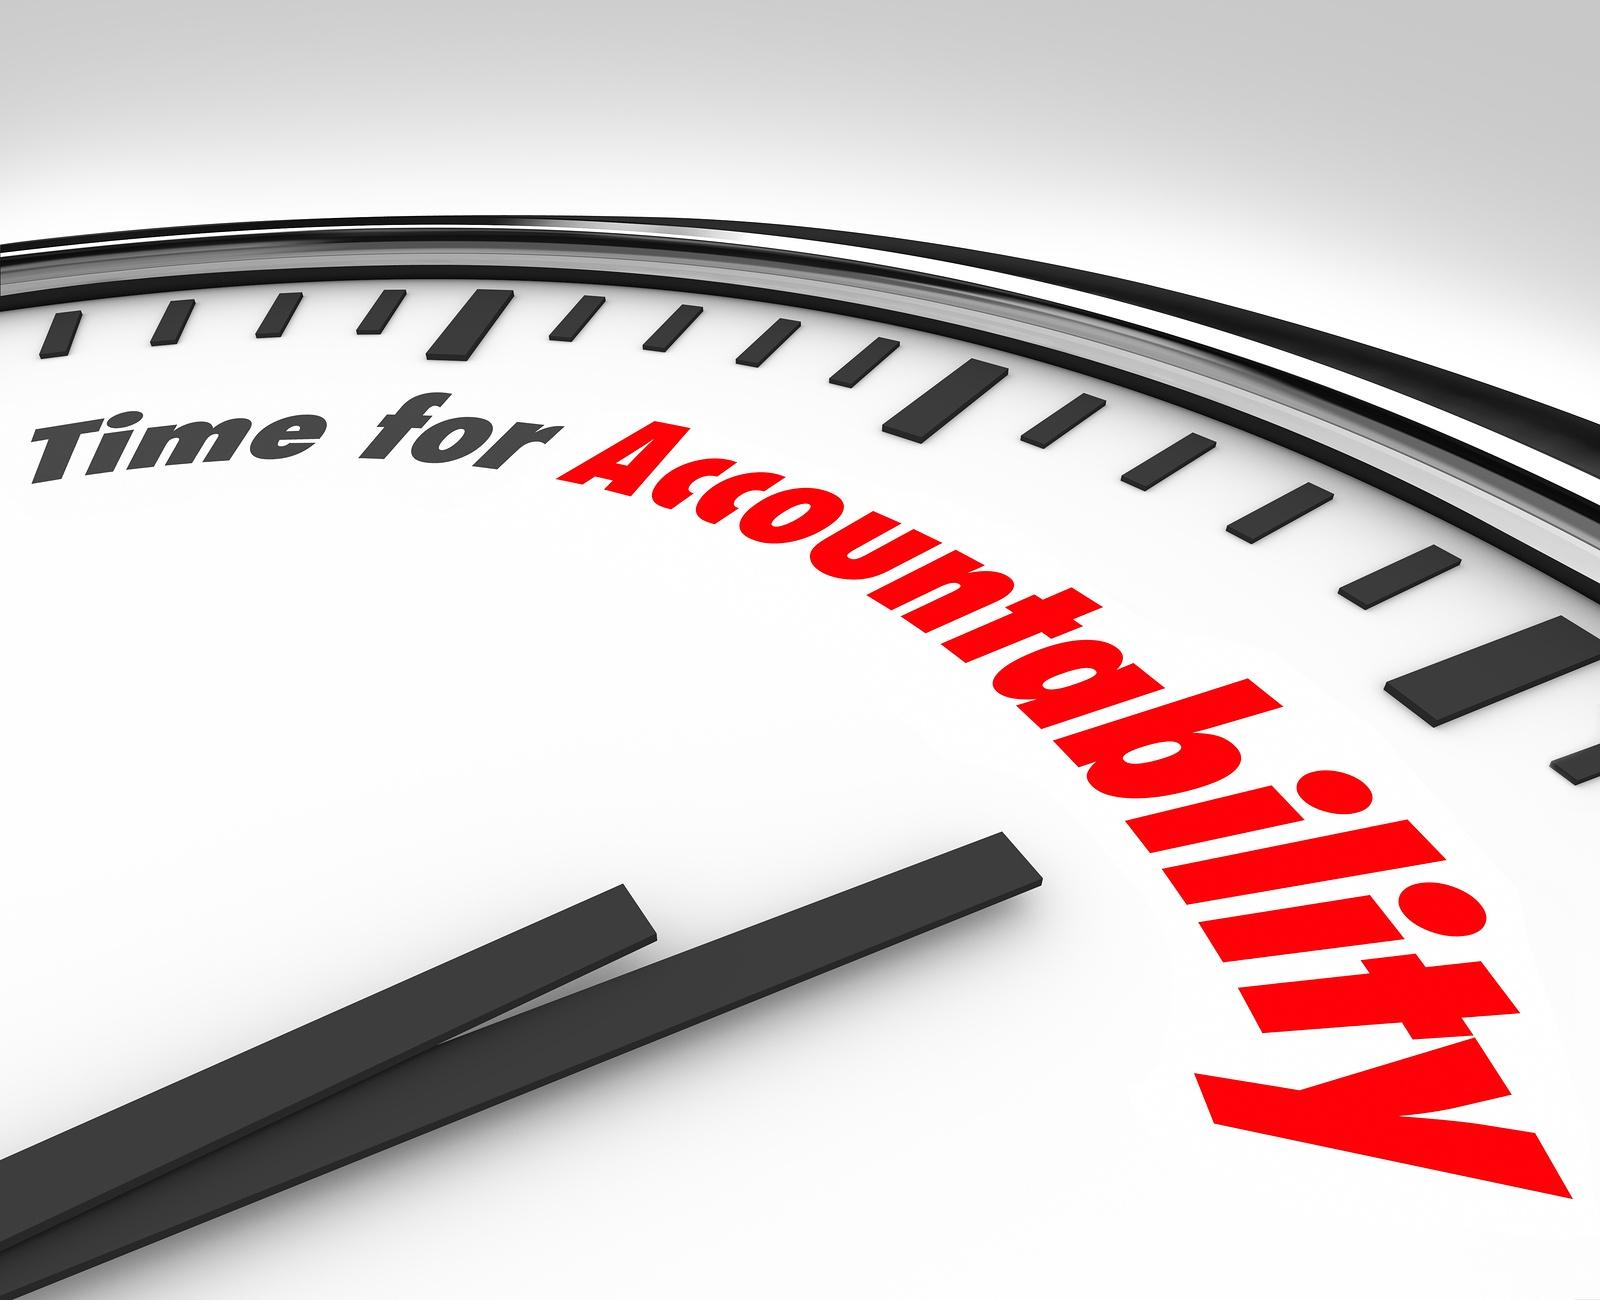 Time-for-Accountability.jpg